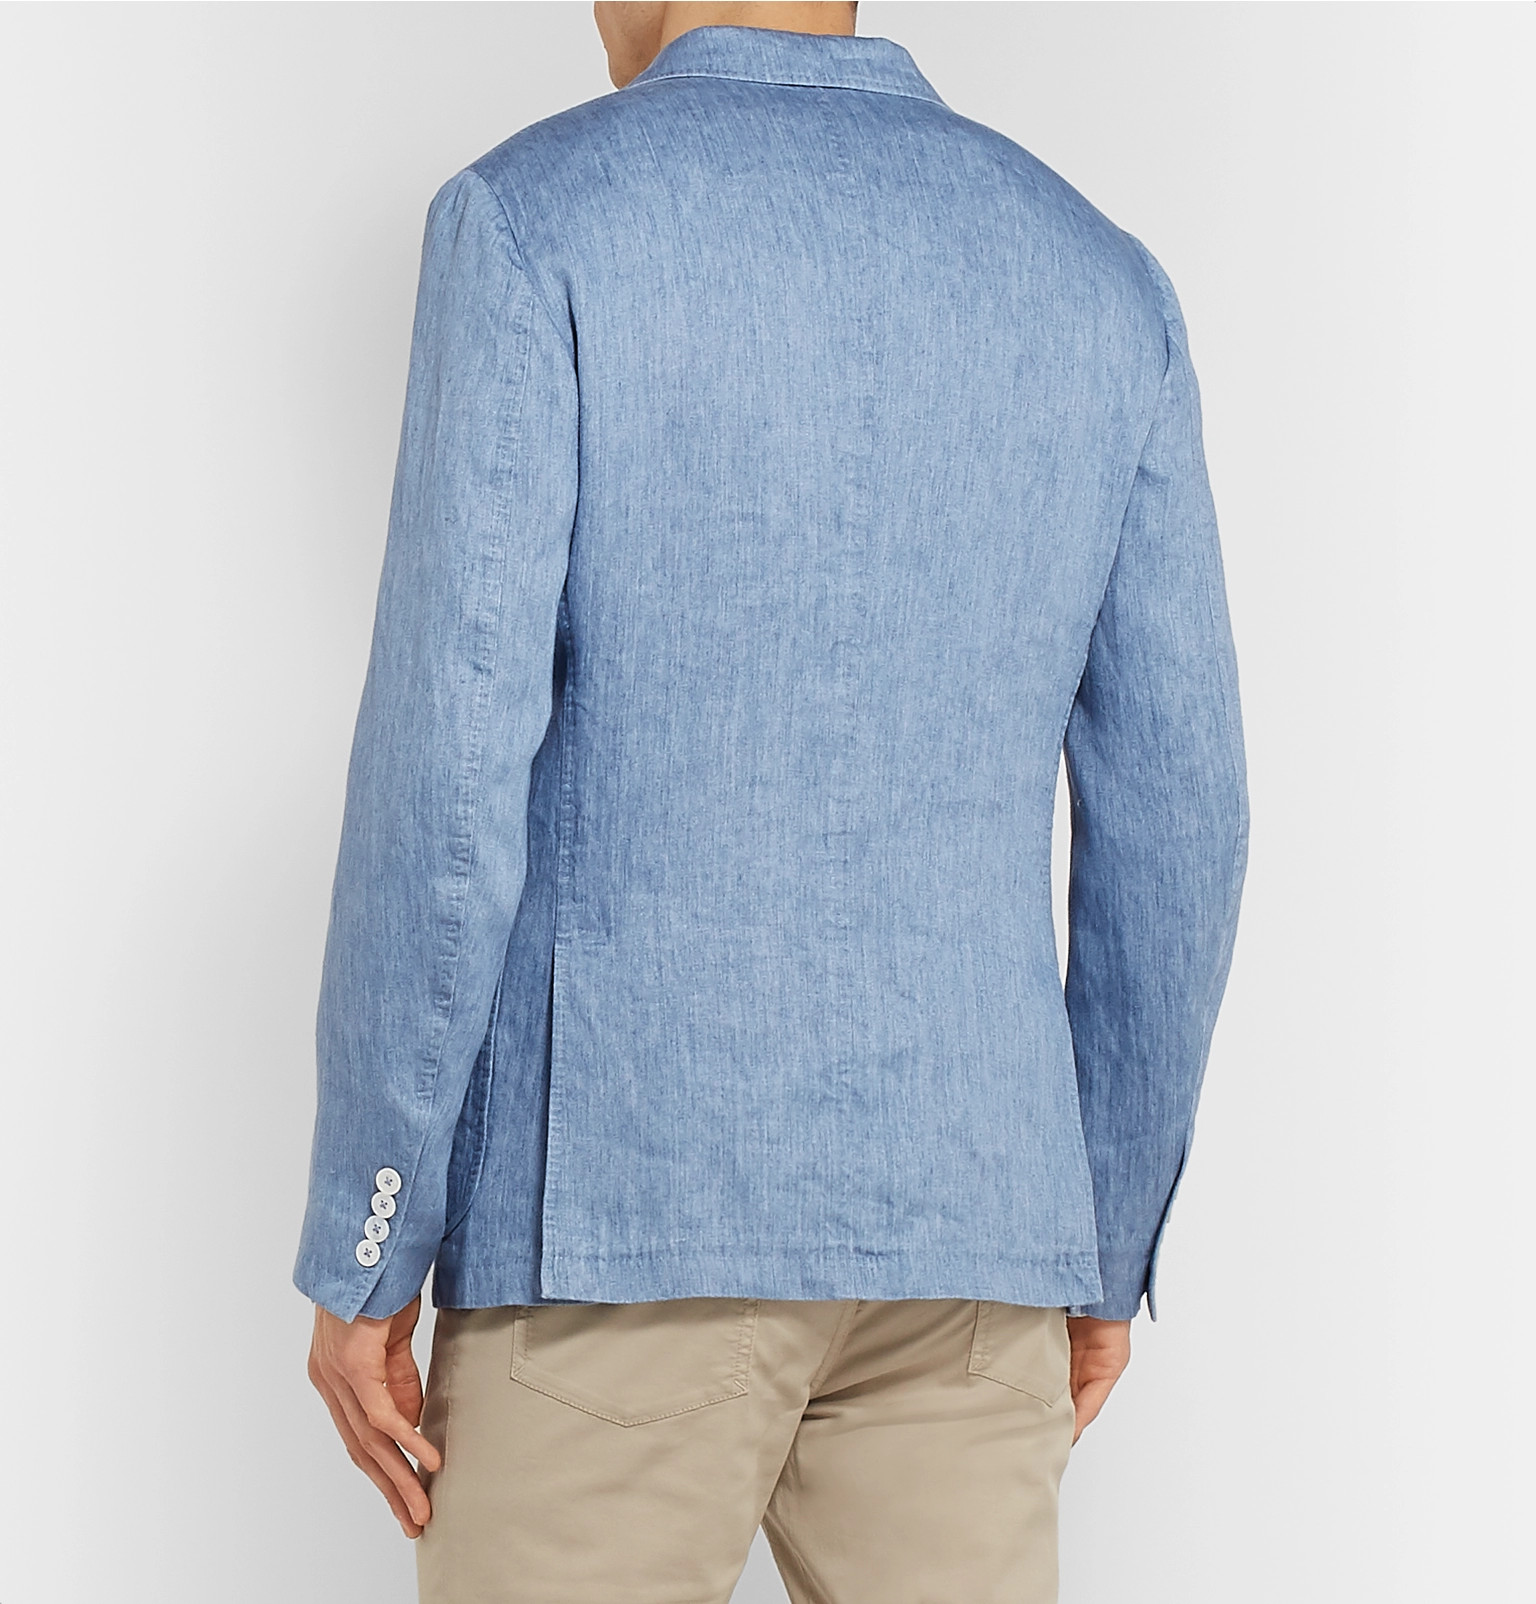 16c4b16f Ermenegildo Zegna - Light-Blue Unstructured Linen Blazer